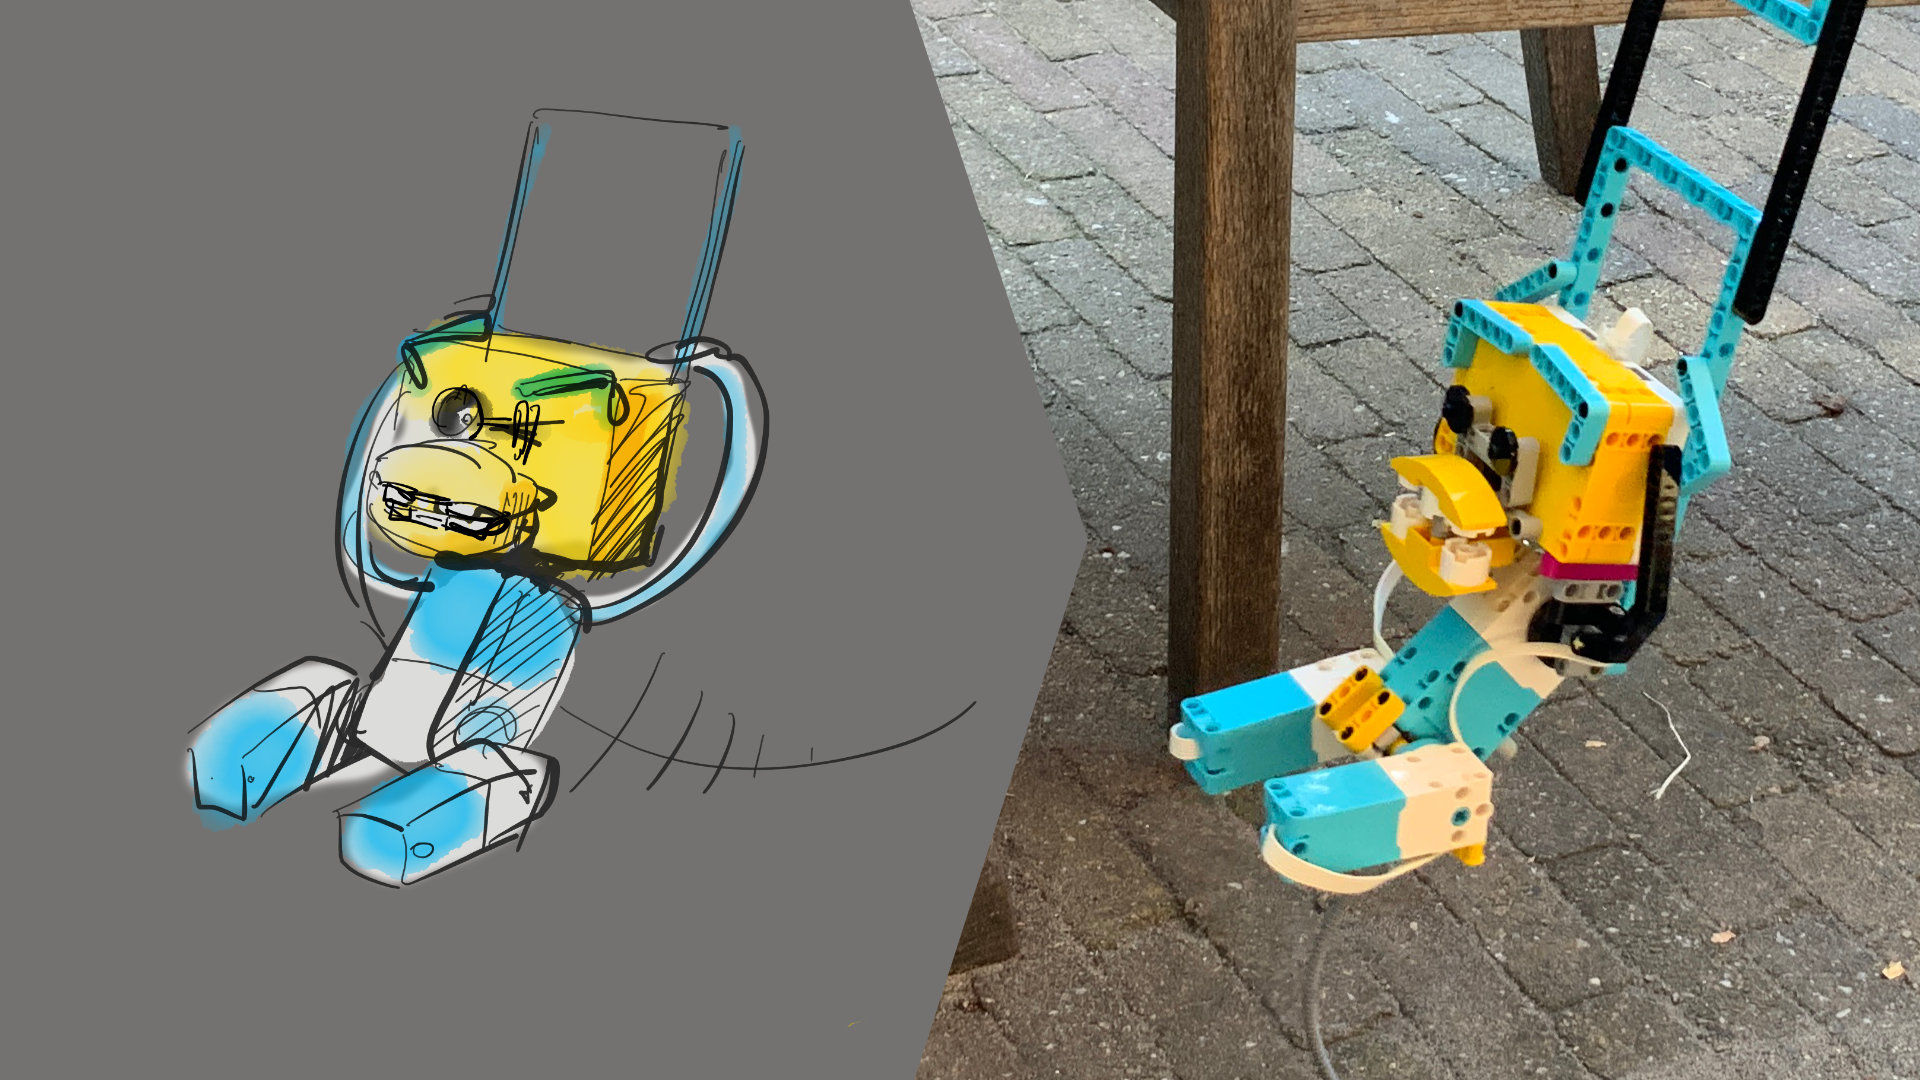 lego robot swing design article